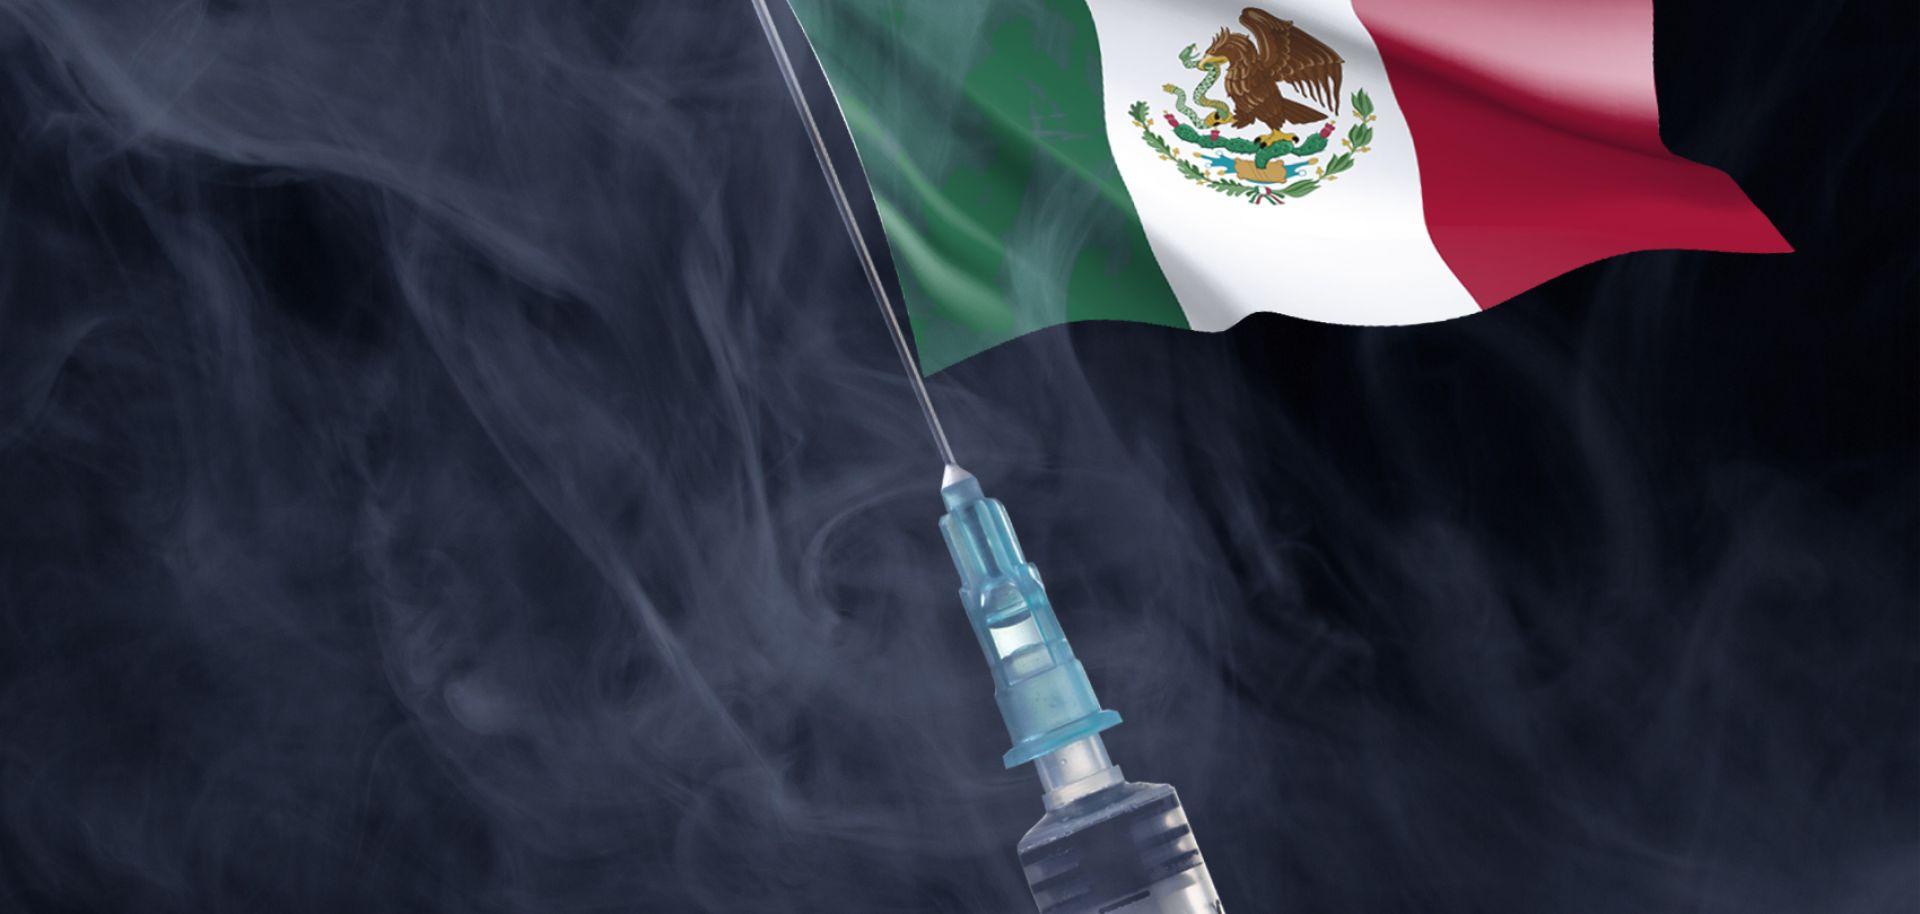 In the Tierra Caliente region, the Cartel de Jalisco Nueva Generacion is the most powerful criminal group.